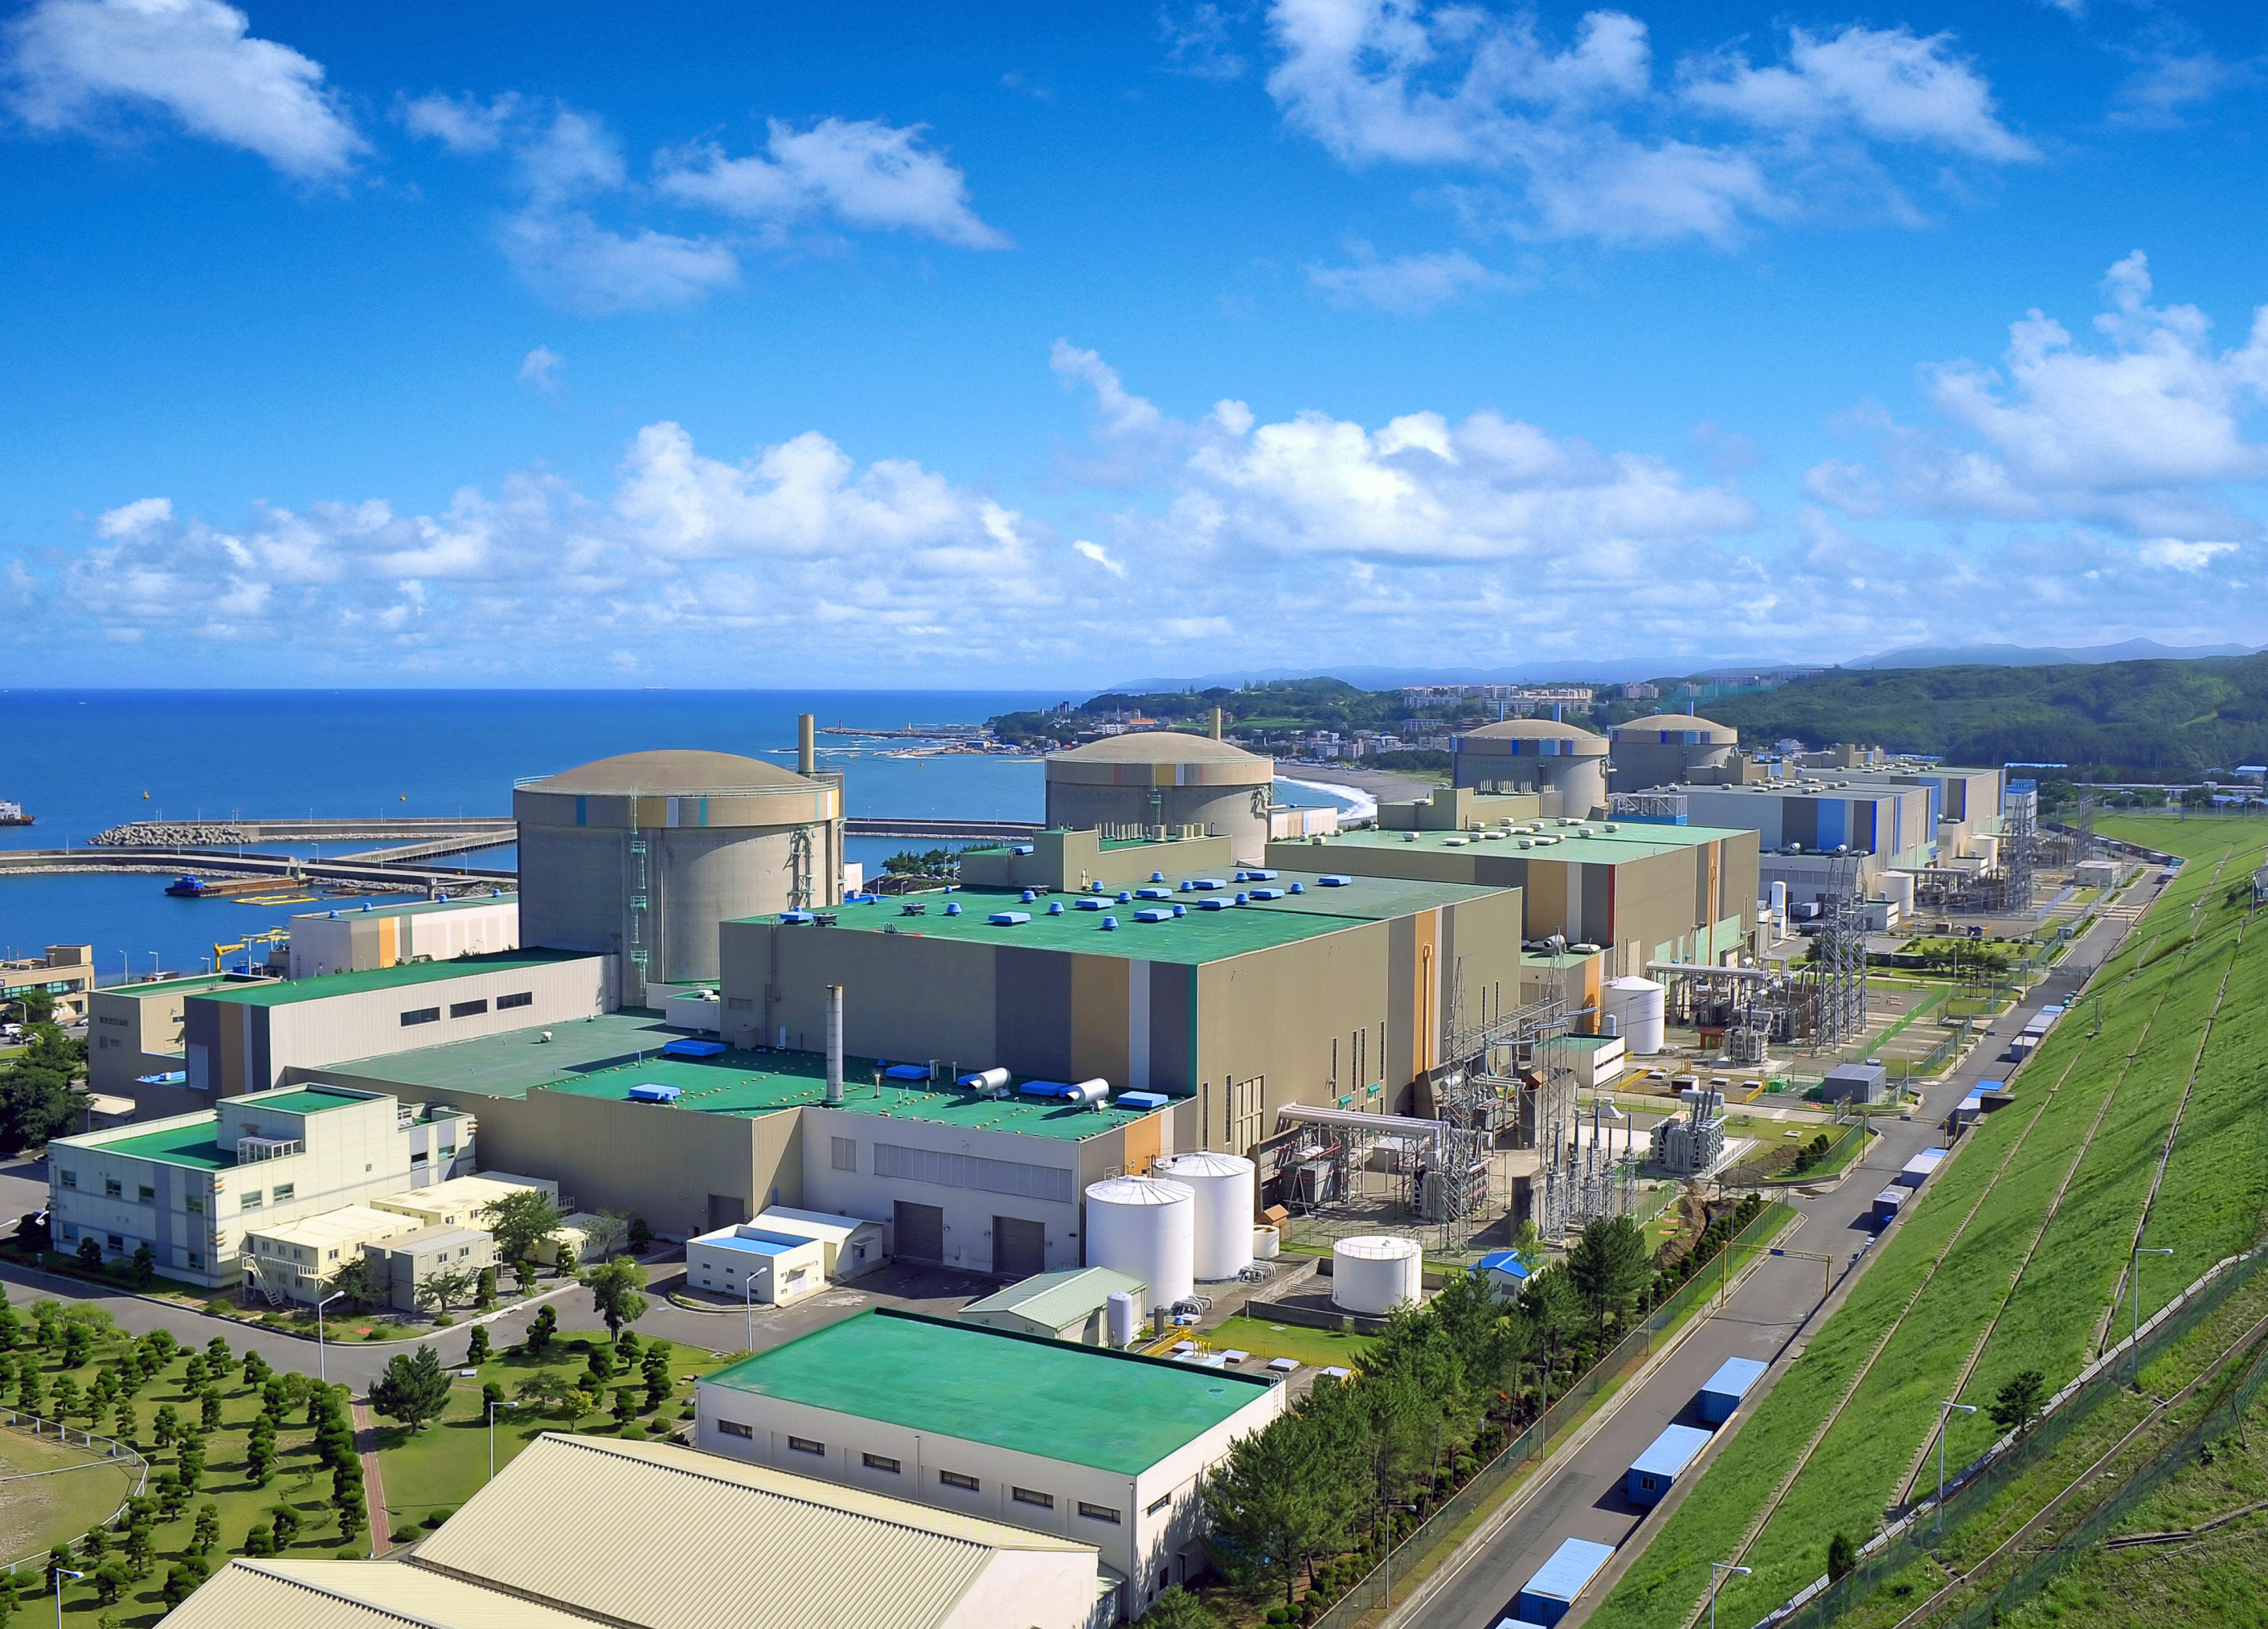 Weolseong Nuclear Power Plant in Gyeongju. (image: Wikimedia)